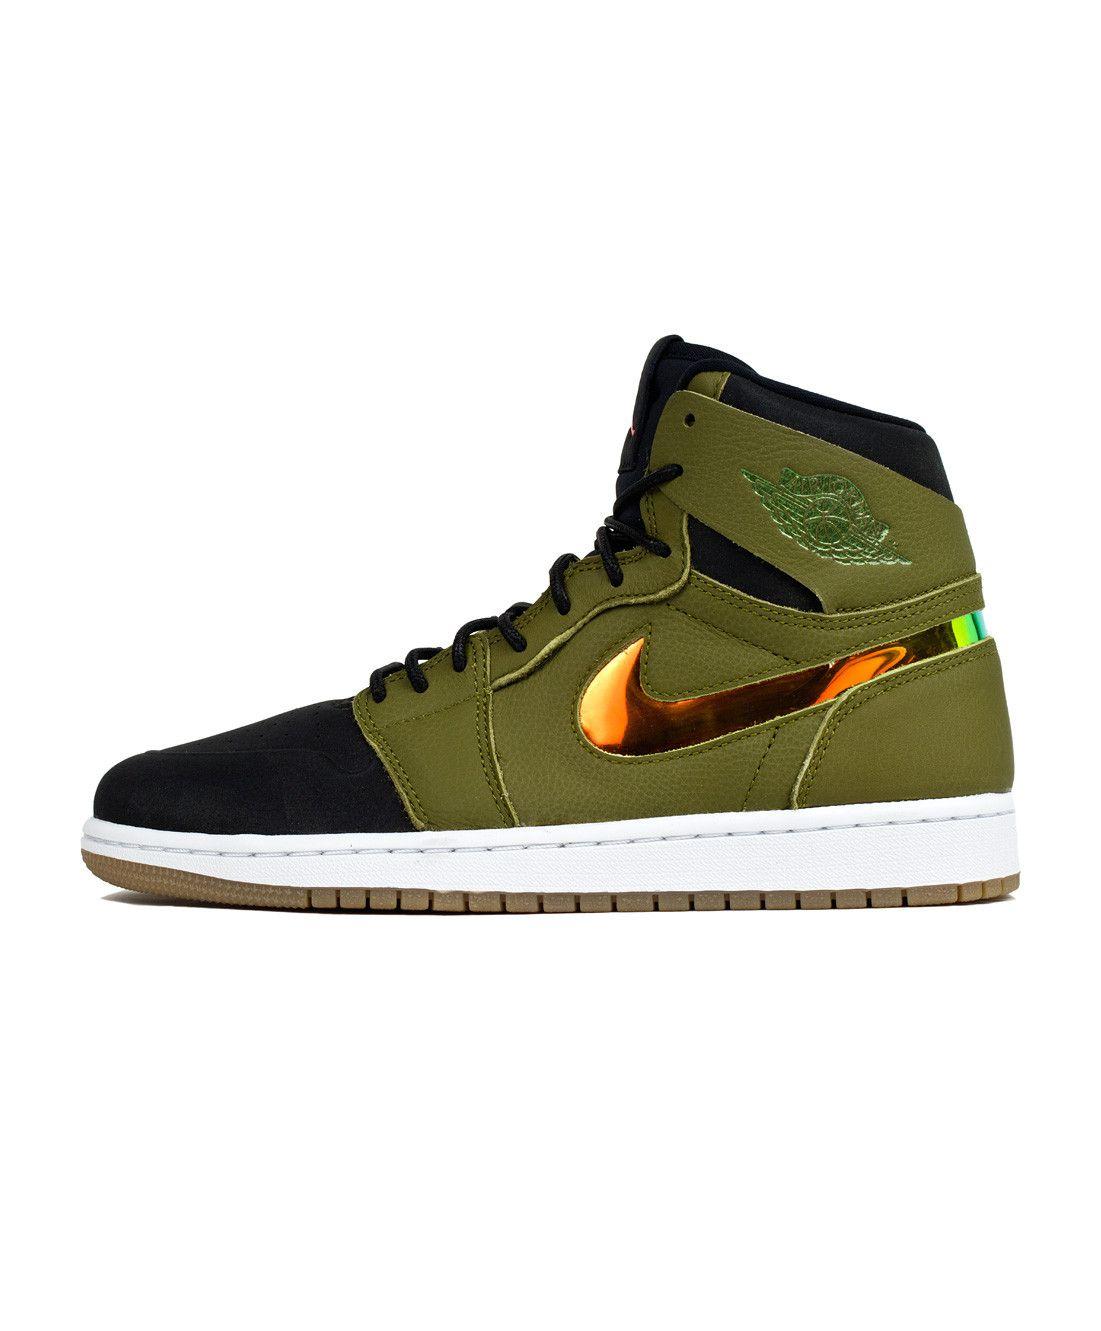 e7ed5fec27c0 Air Jordan 1 Retro High Nouveau - Militia Green Hyper Orange